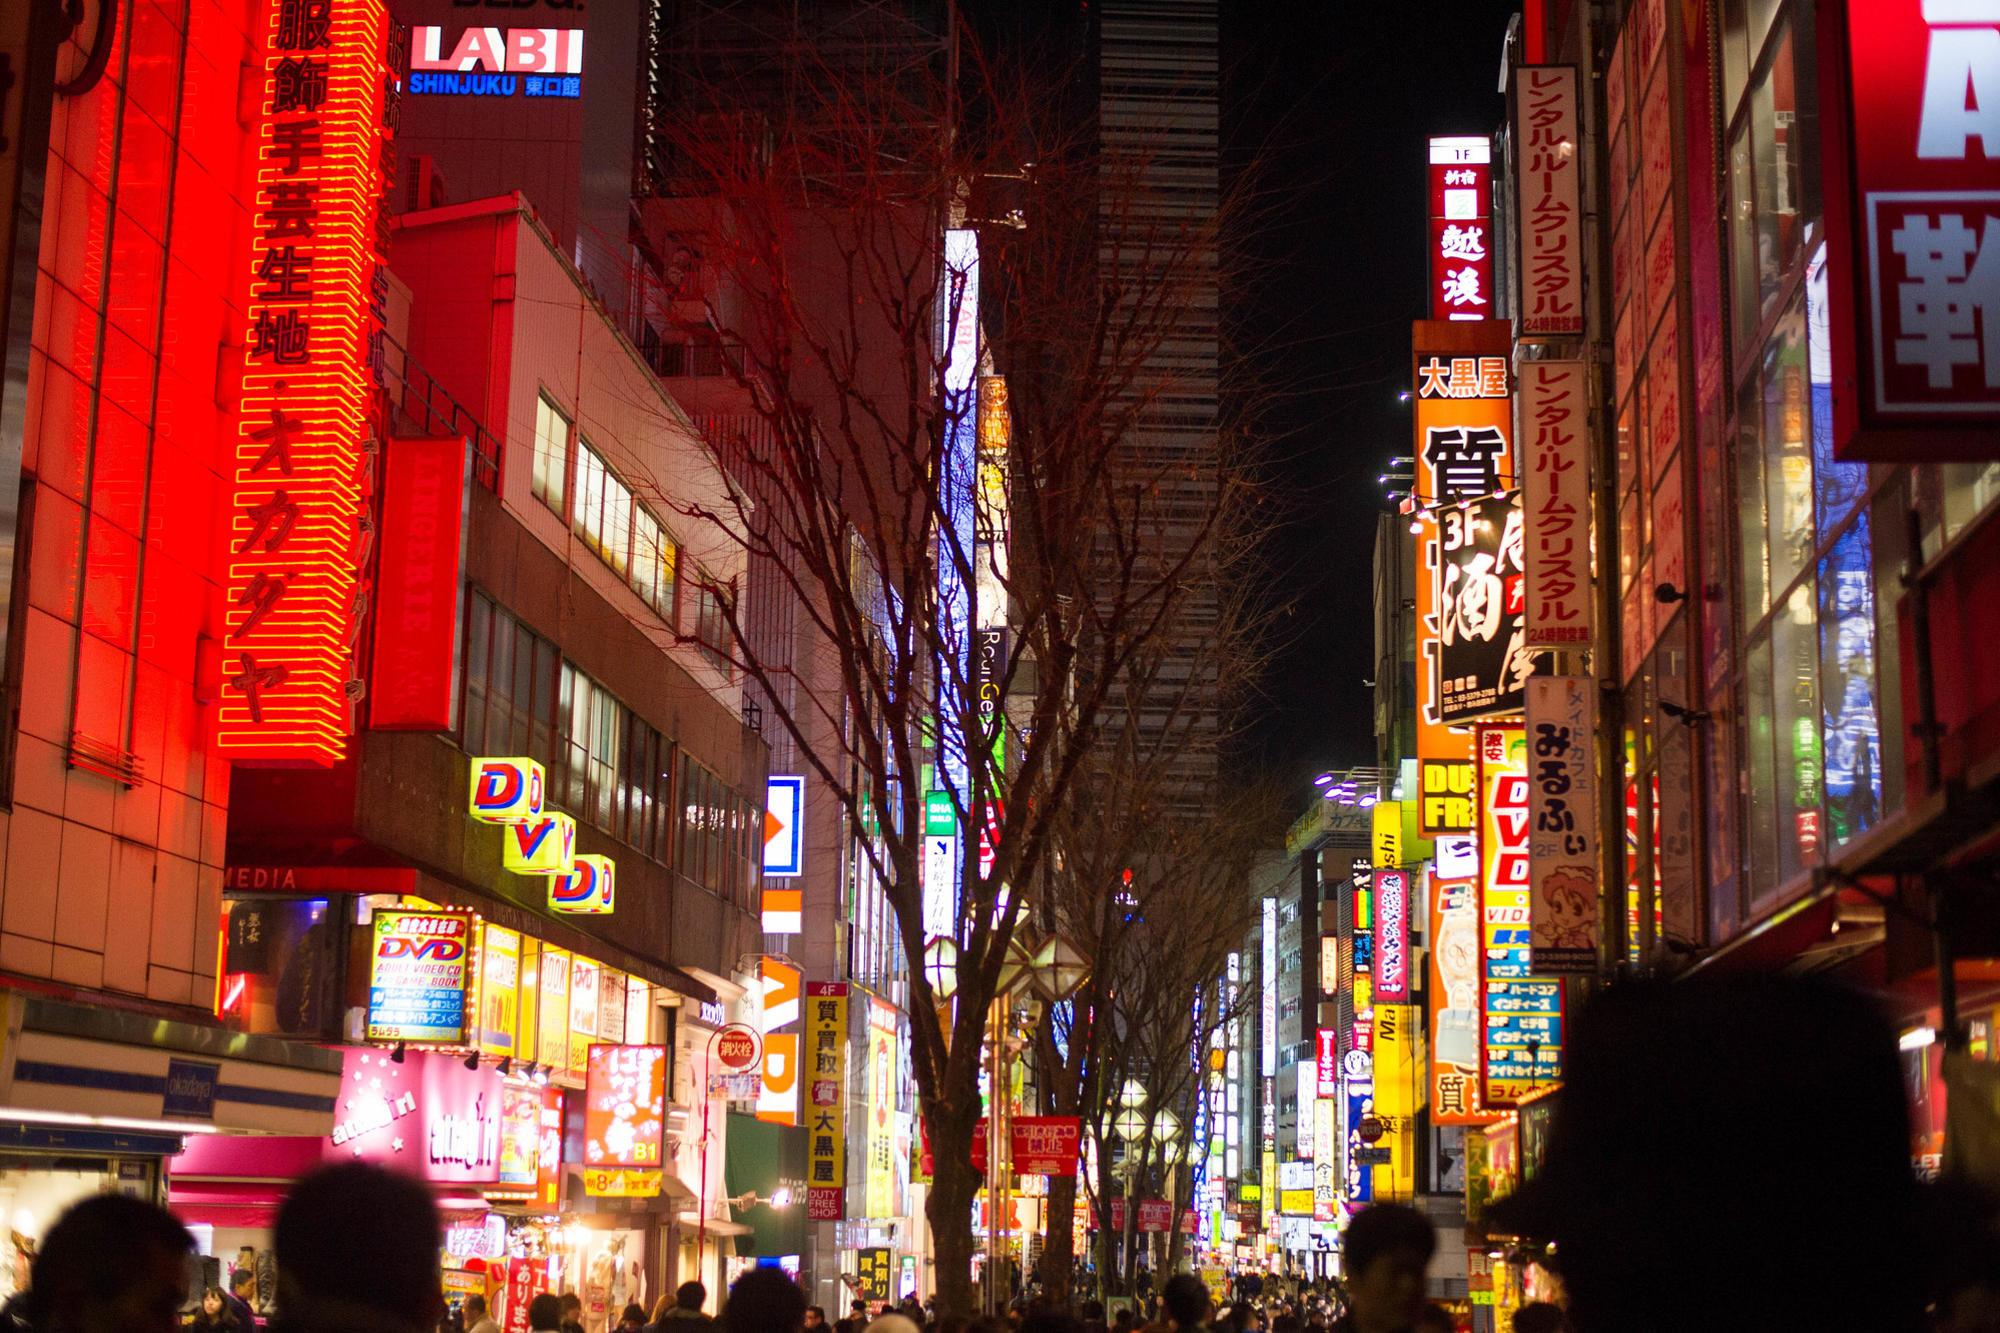 Shinjuku's neon-lit, crowded streets at night in Tokyo